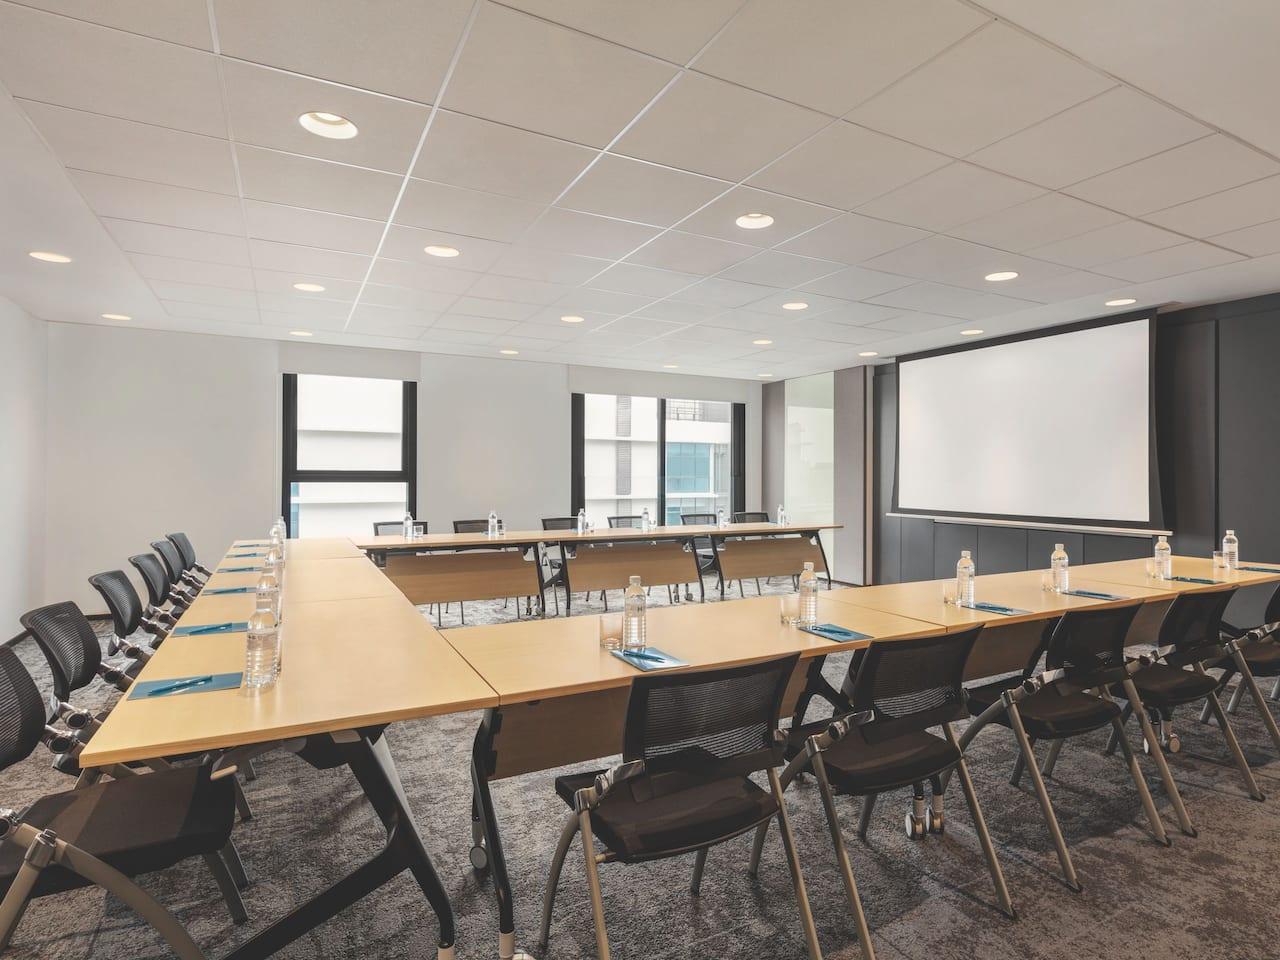 Meeting Space Ushape Setup